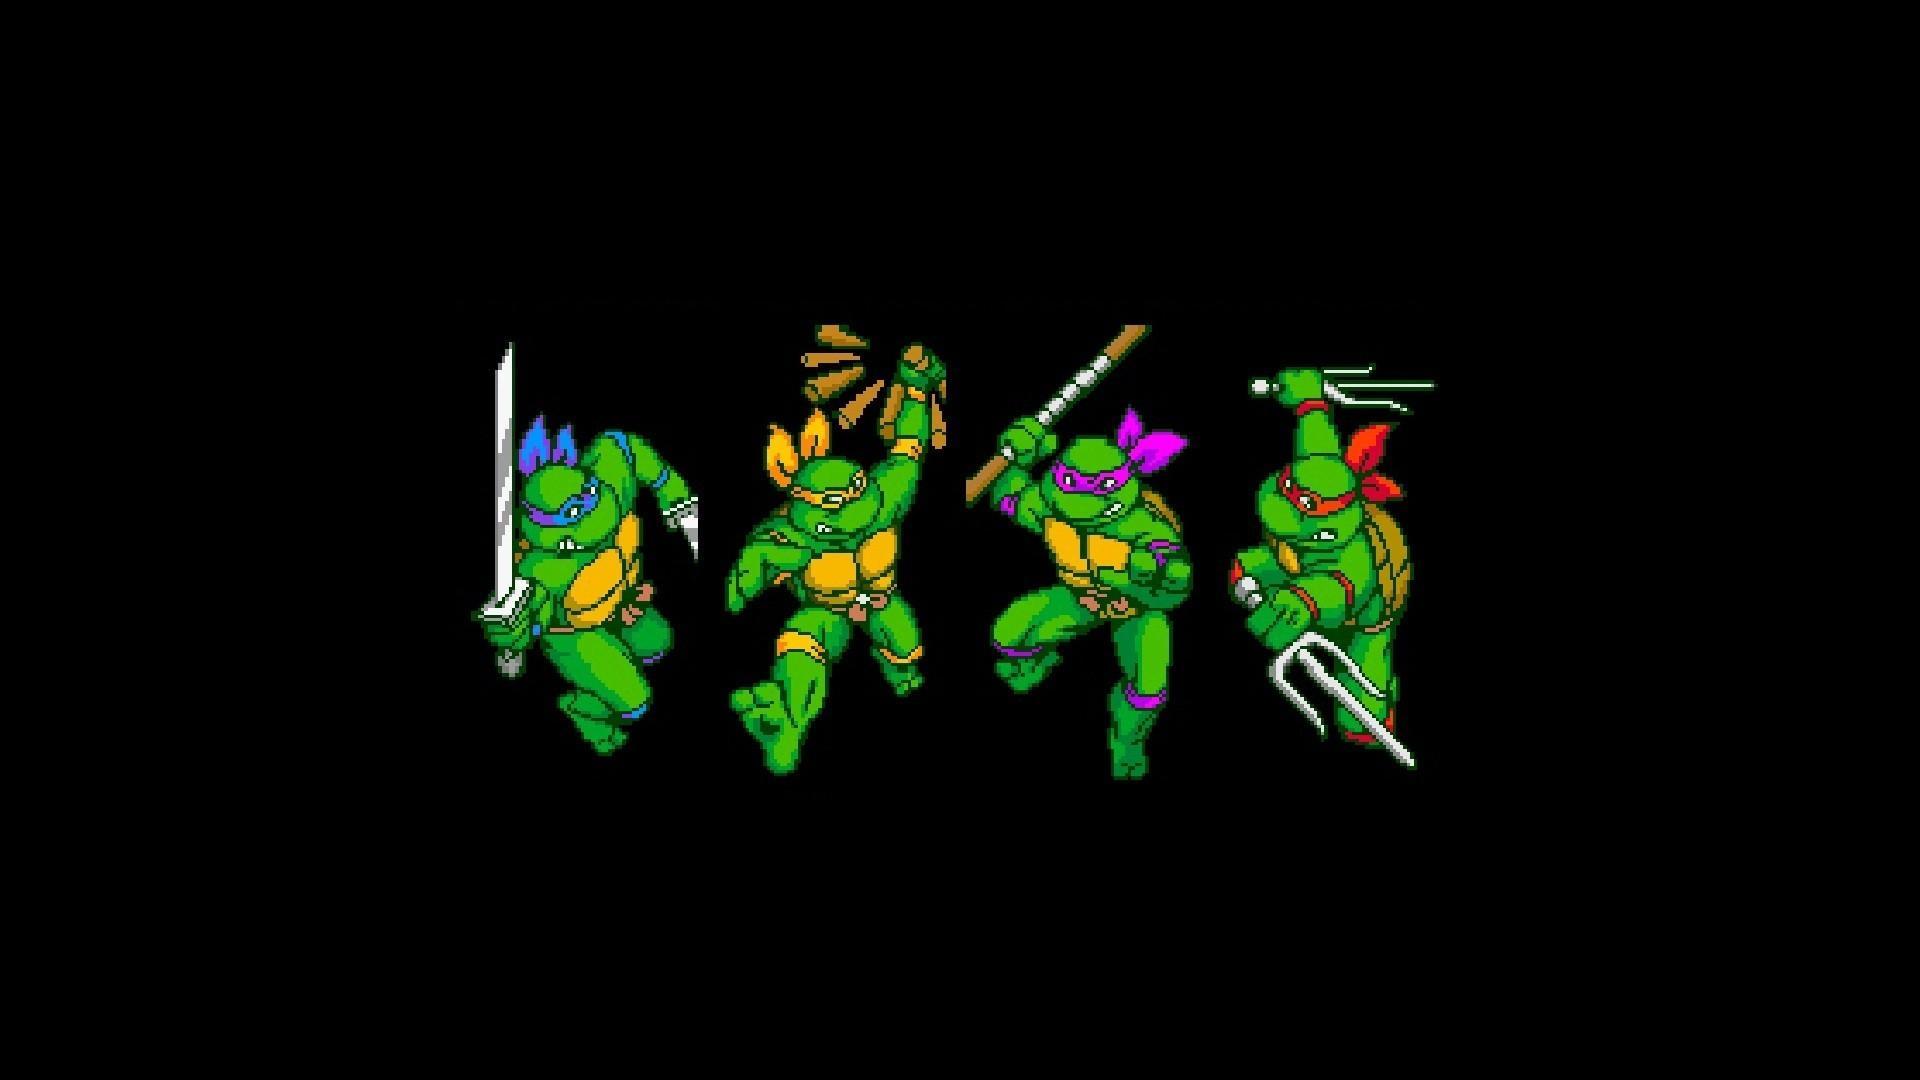 Free Download Teenage Mutant Ninja Turtles Wallpaper 70850